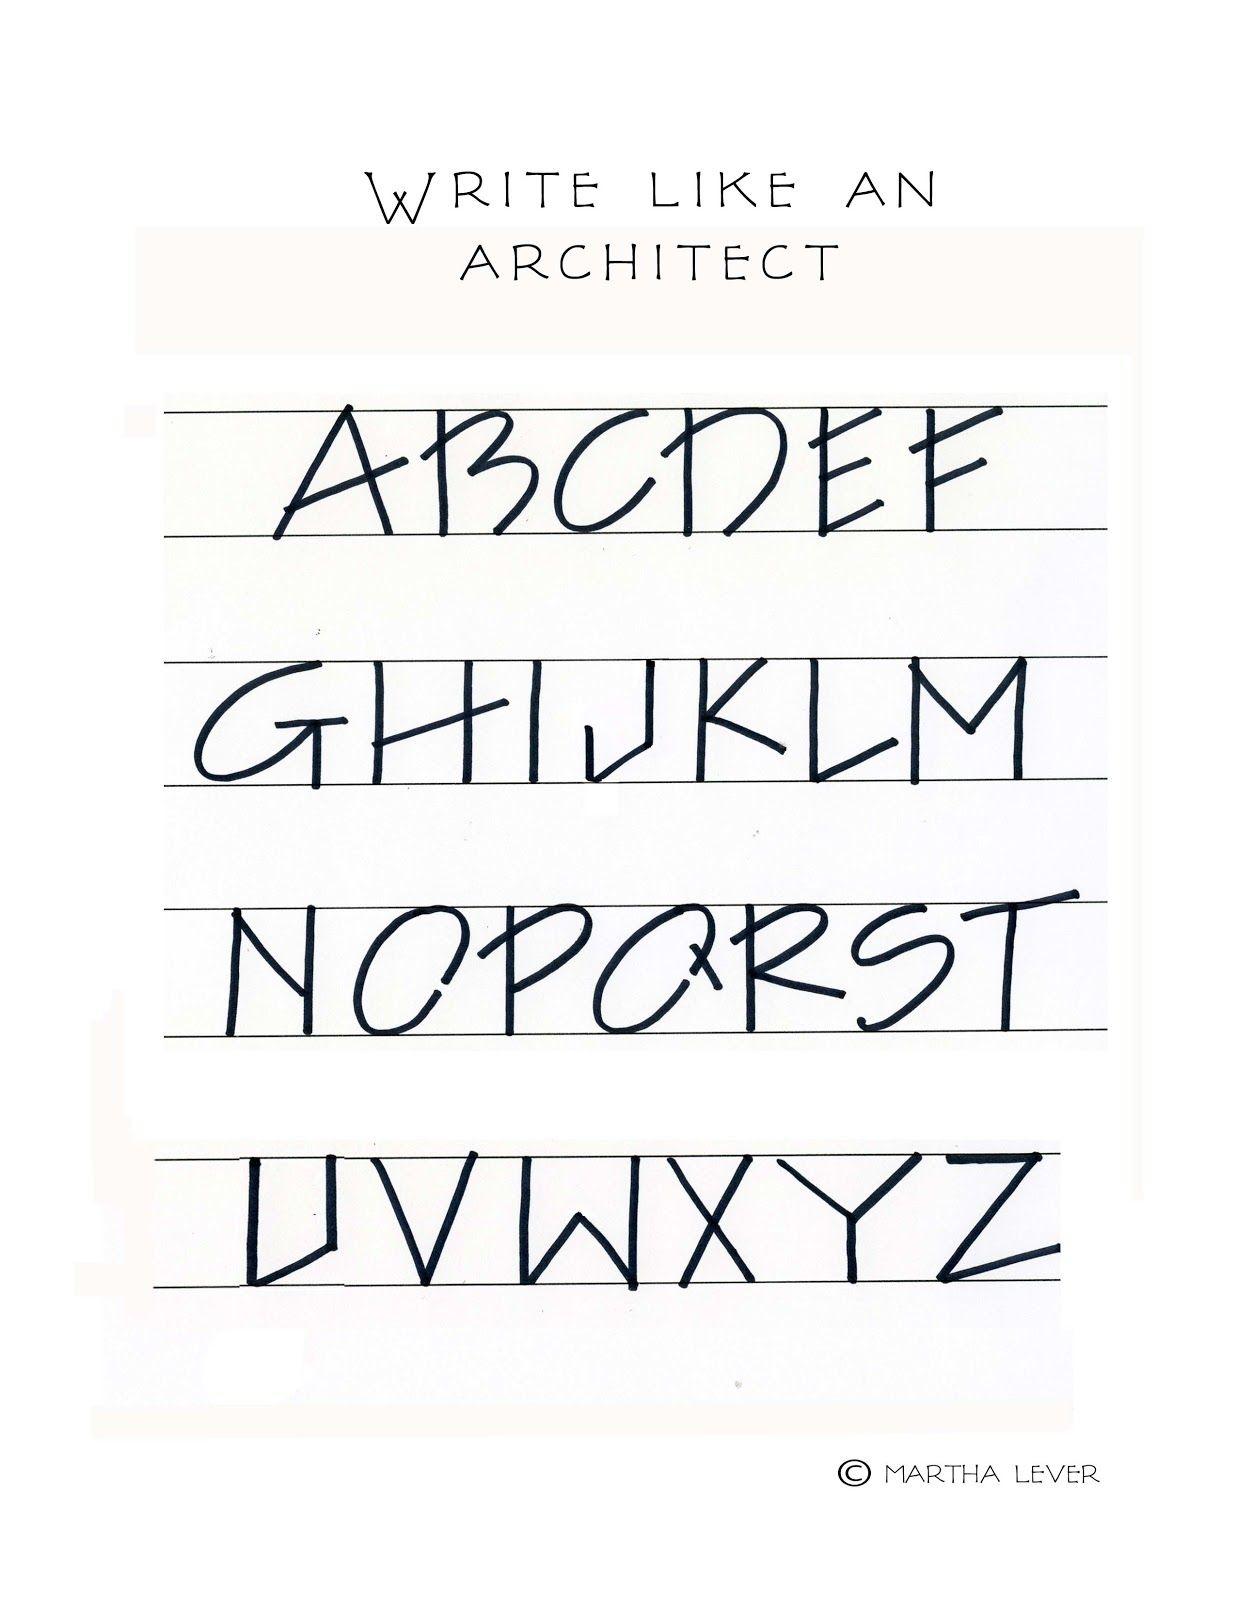 Martha S Paintings Architect Writing